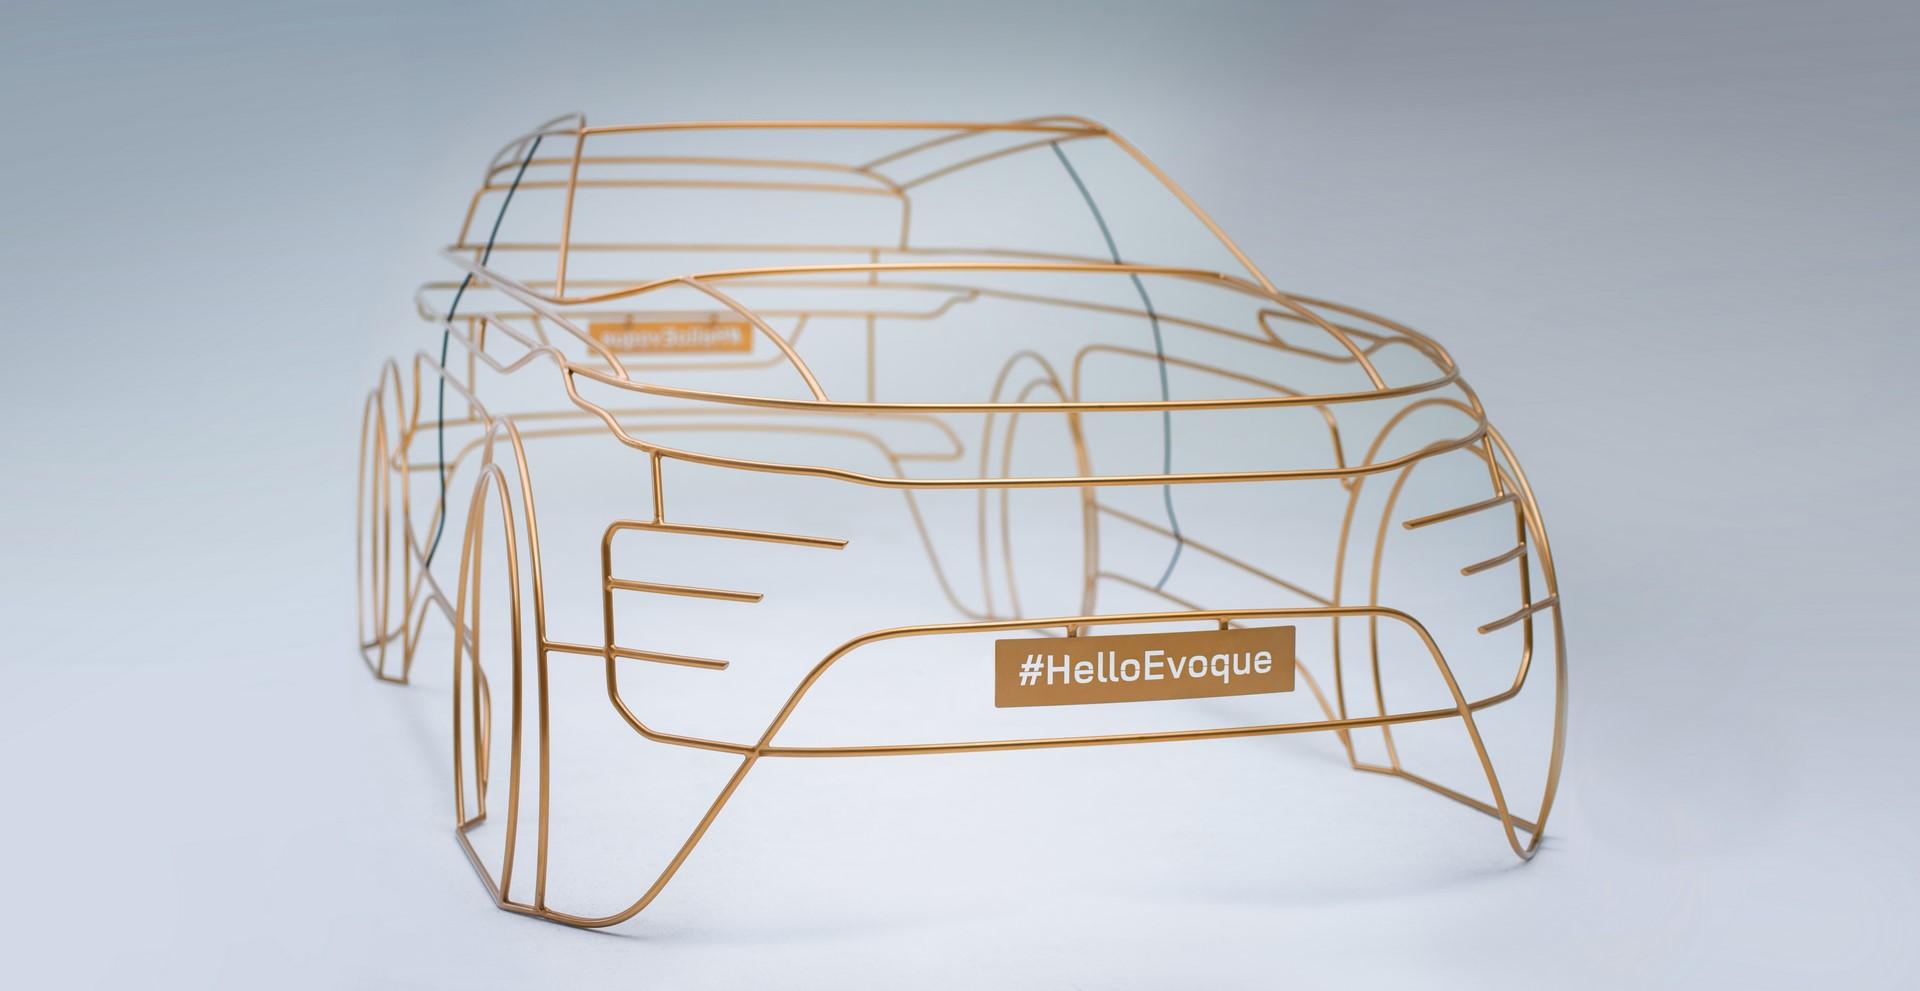 2020 Range Rover Evoque teaser (1)